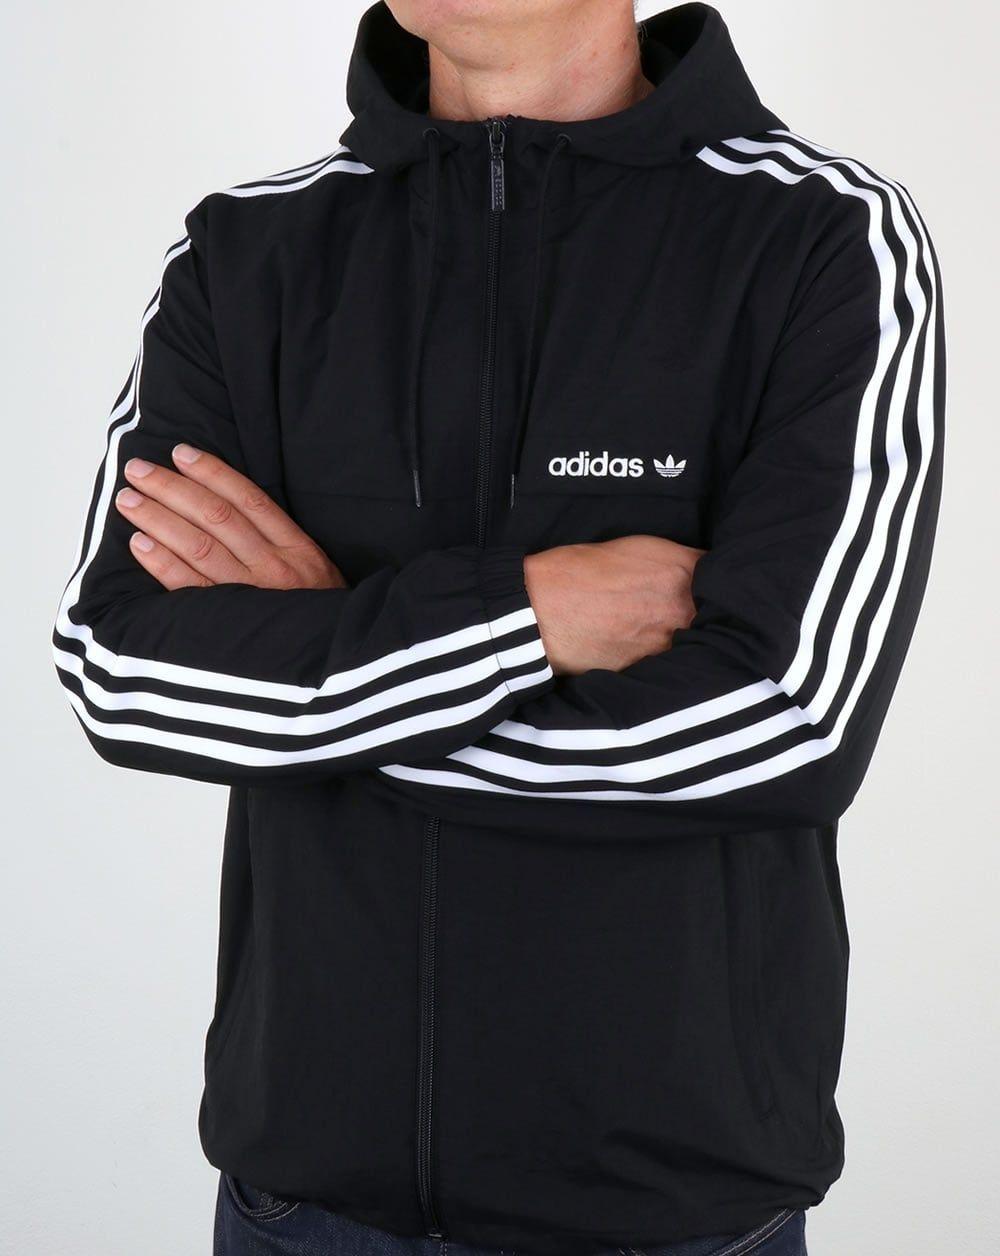 d954fb1701ef Adidas Originals 3 Striped Windbreaker Black